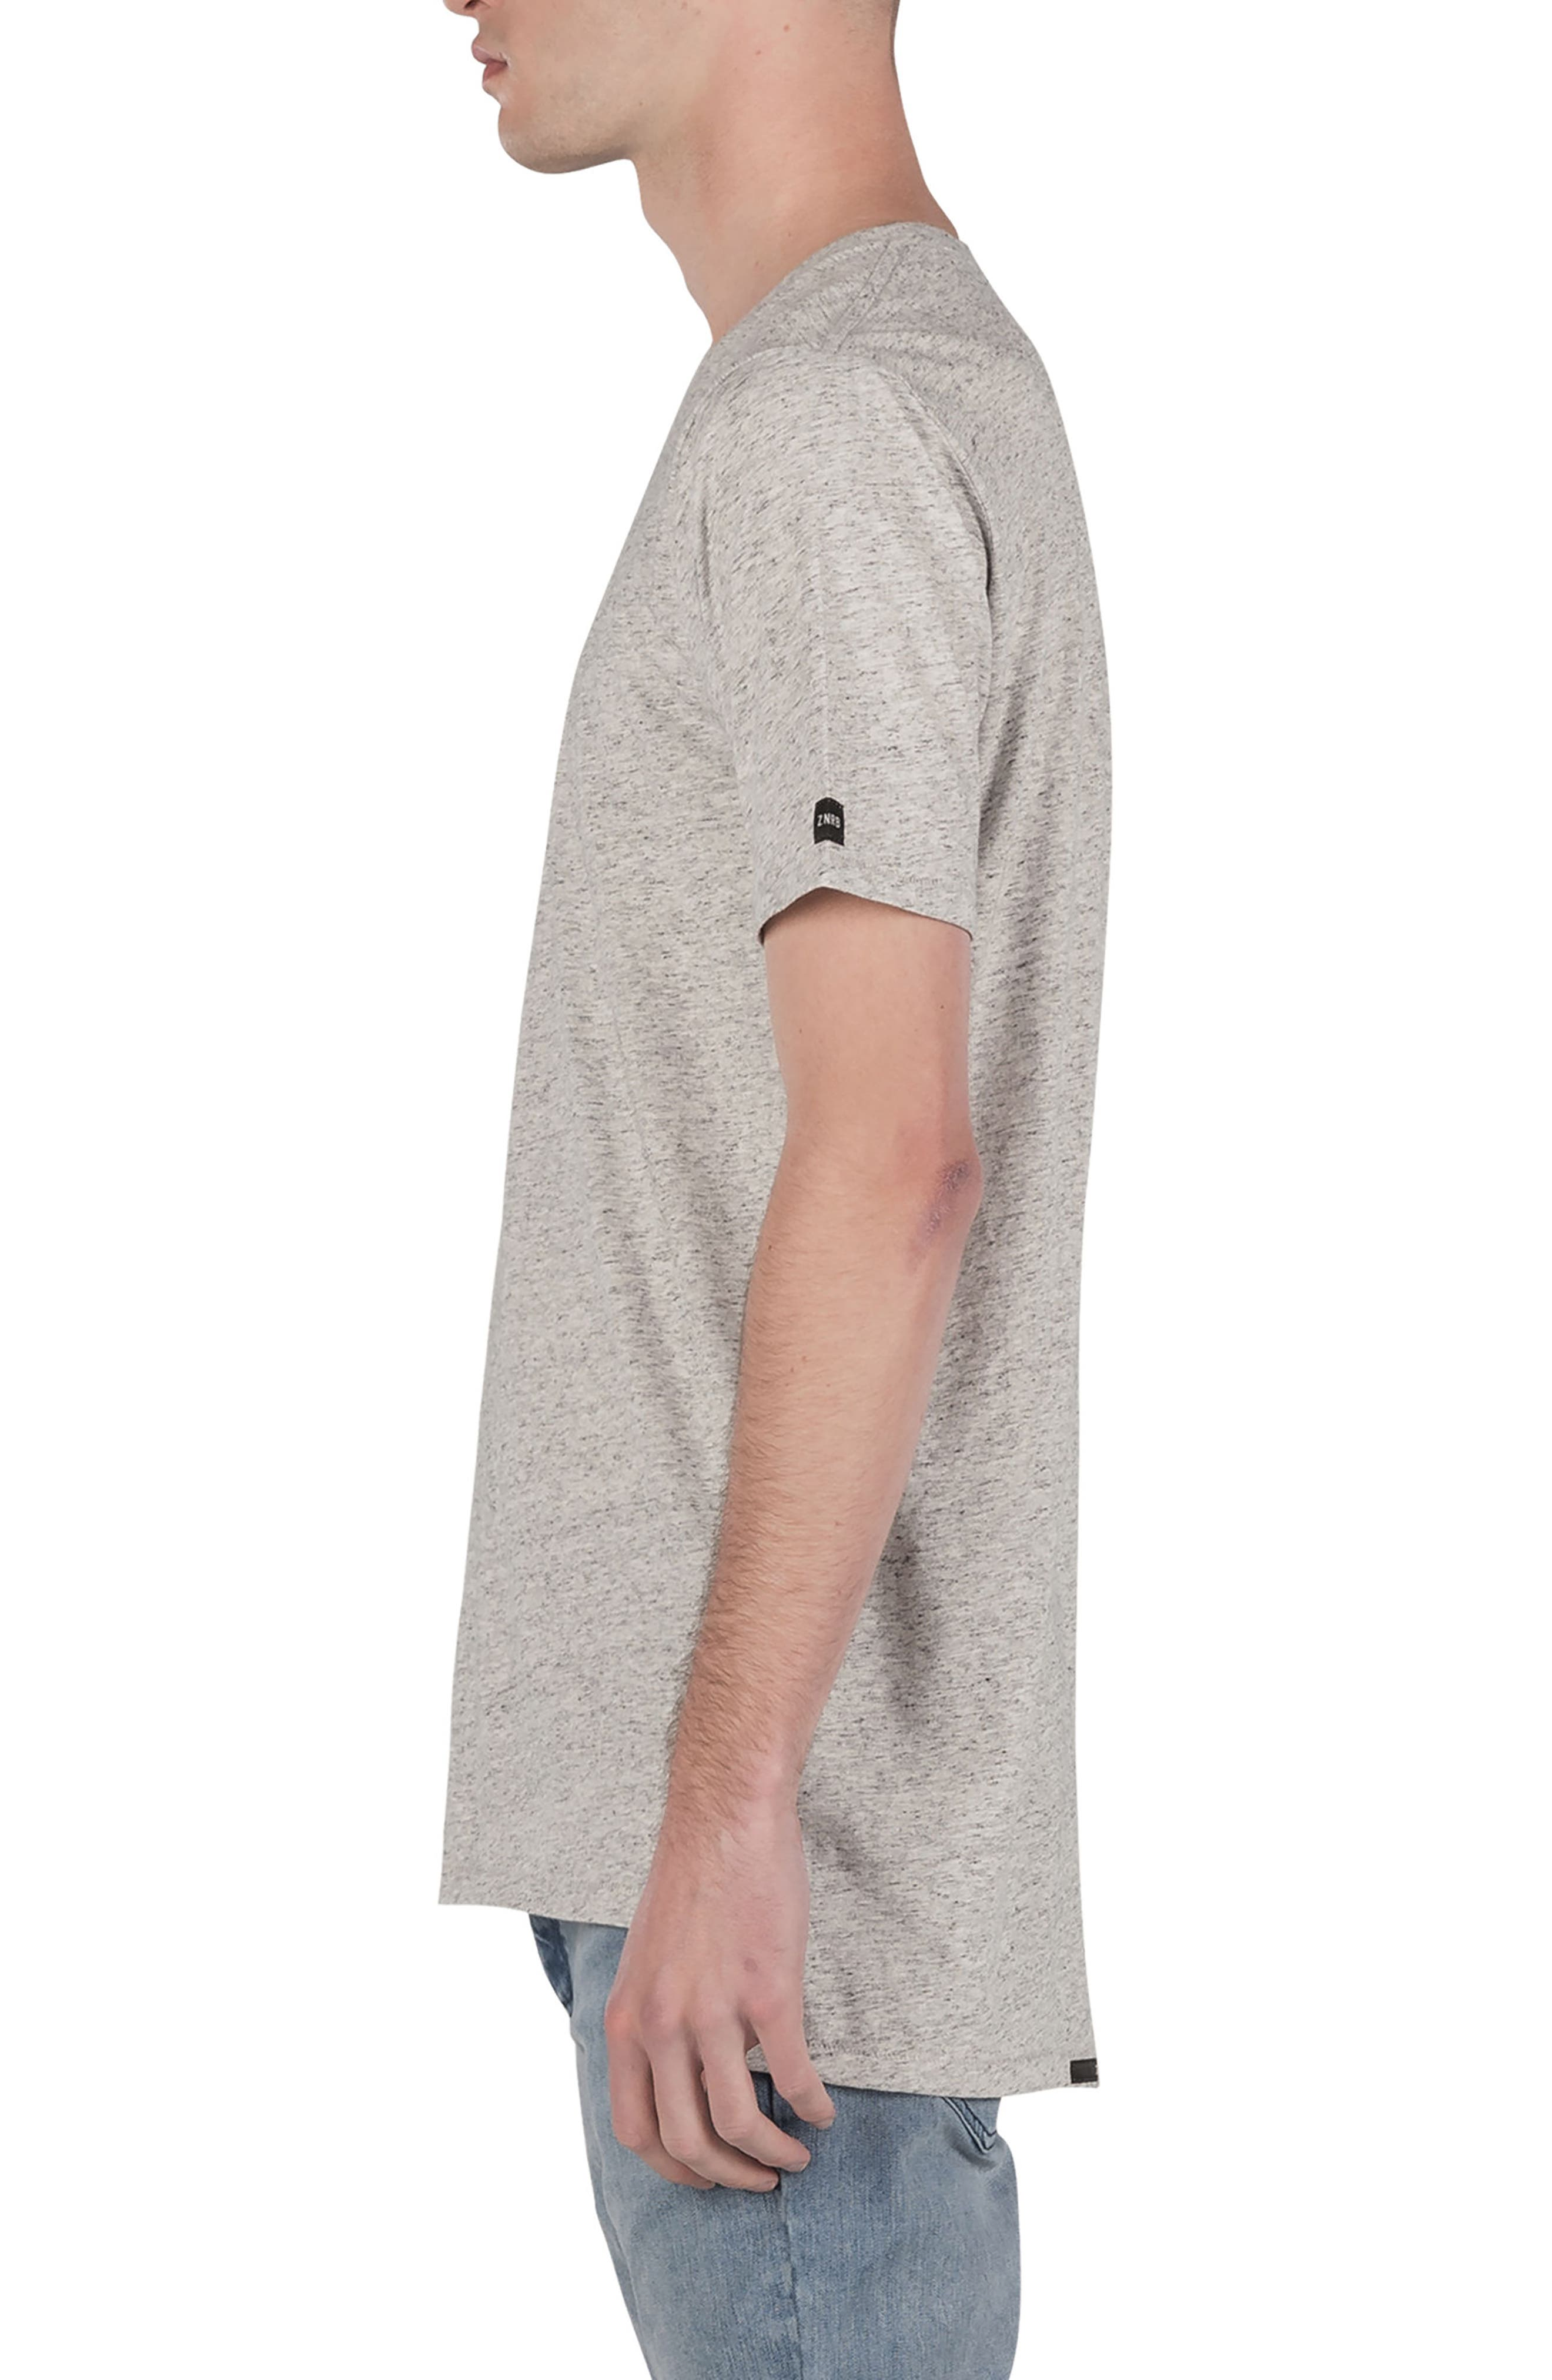 Flintlock T-Shirt,                             Alternate thumbnail 3, color,                             Storm Marl